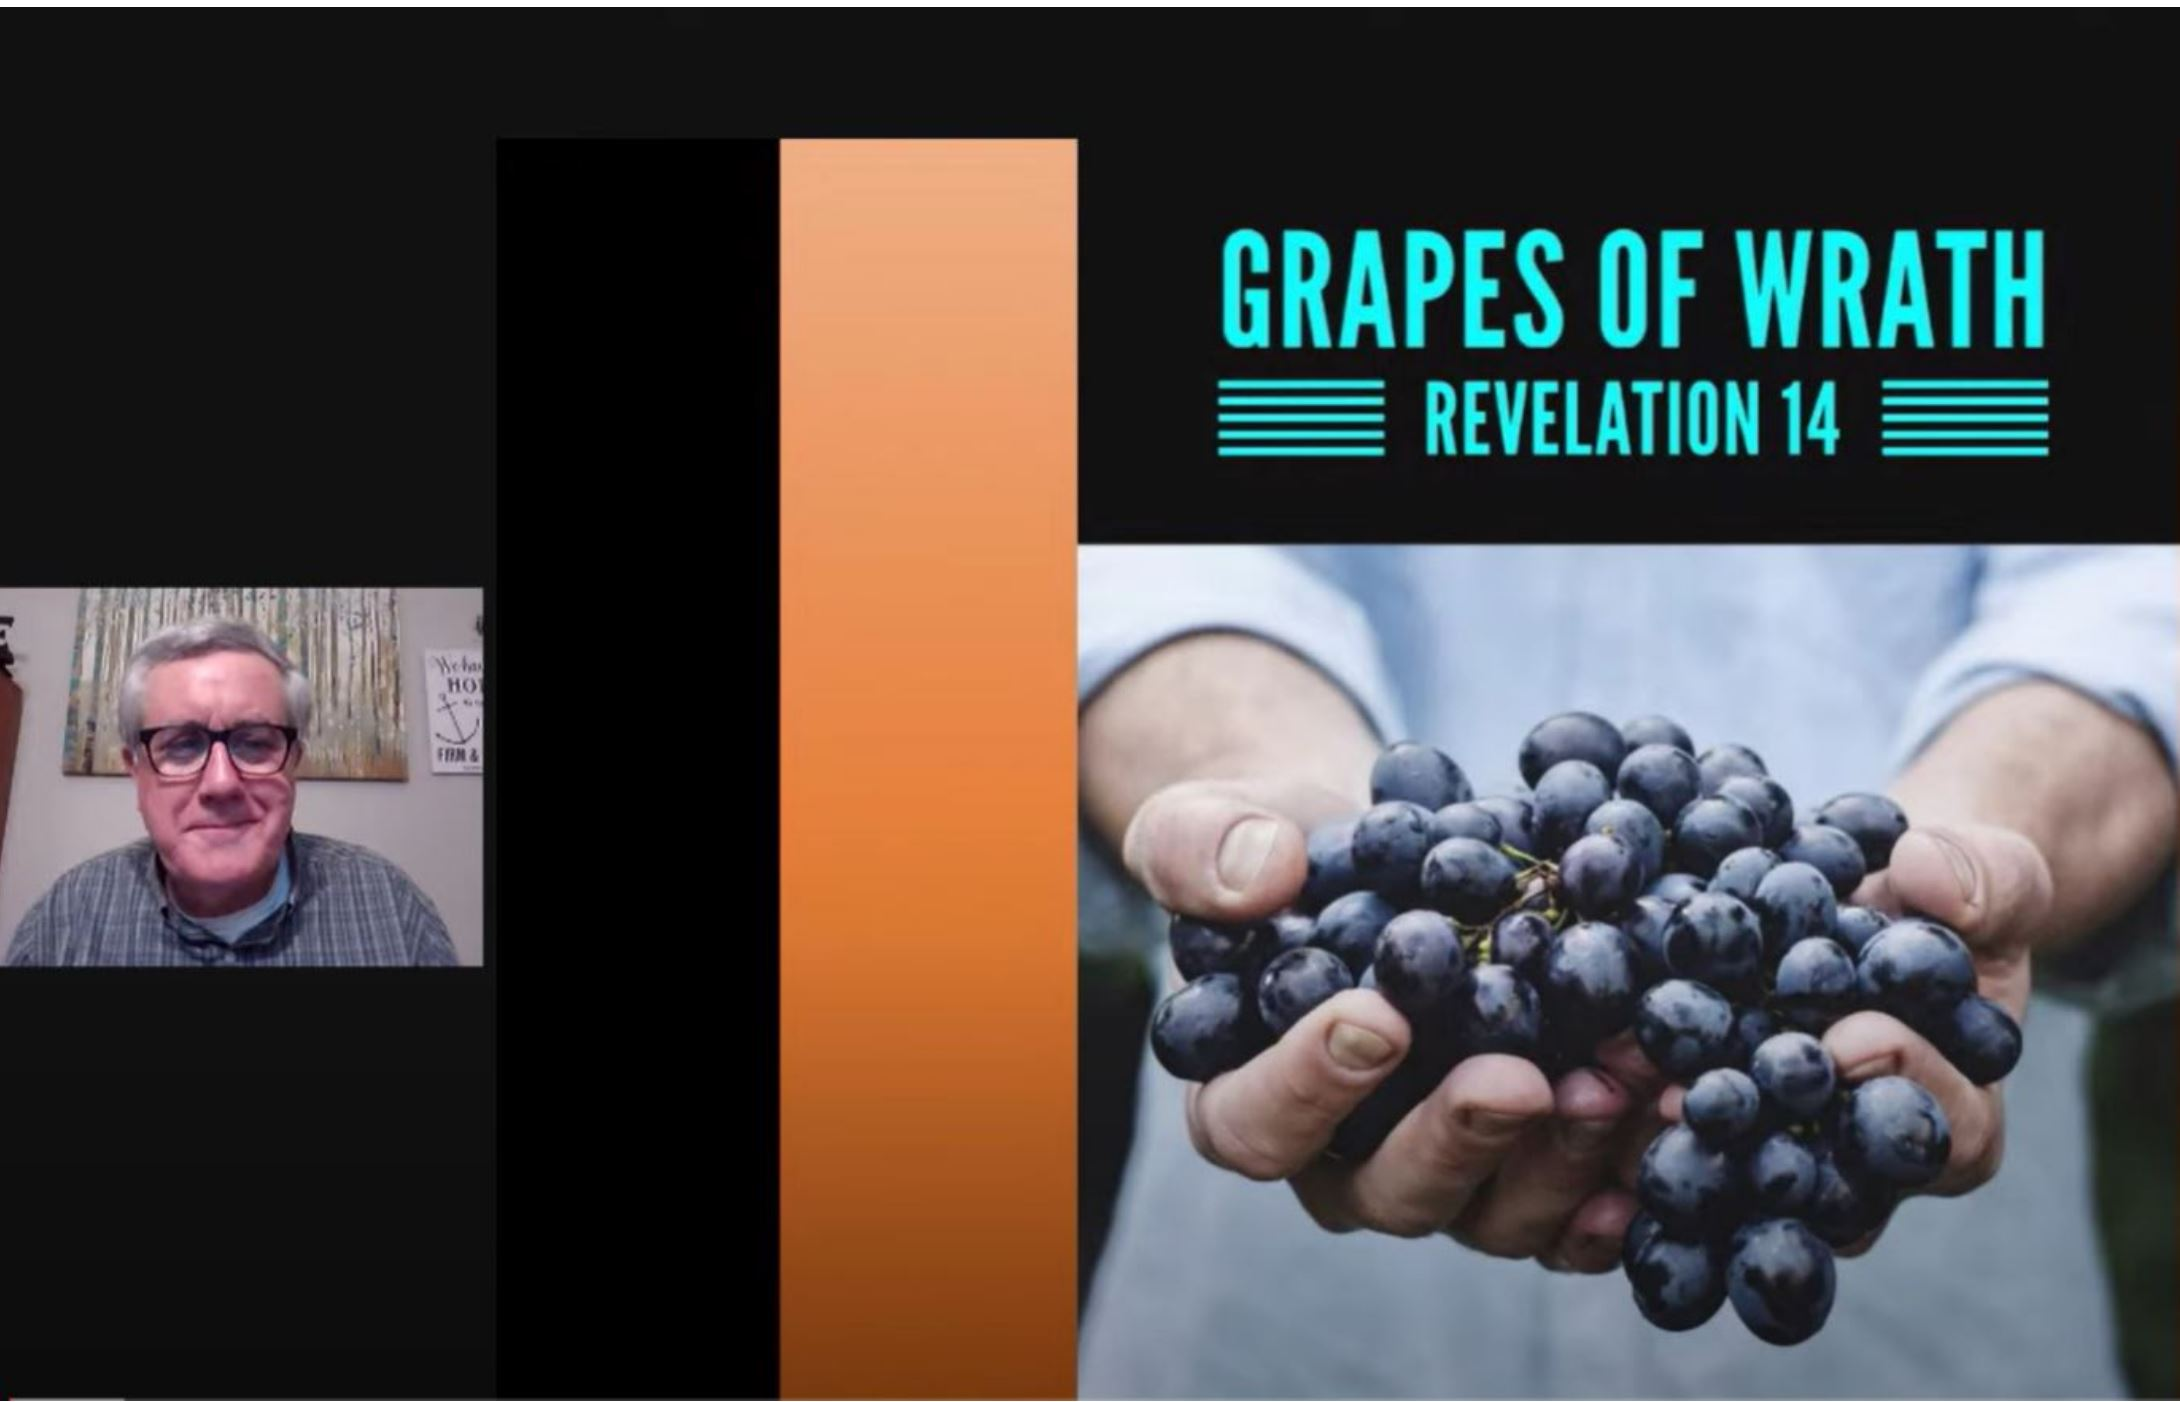 Grapes of Wrath (Revelation 14)